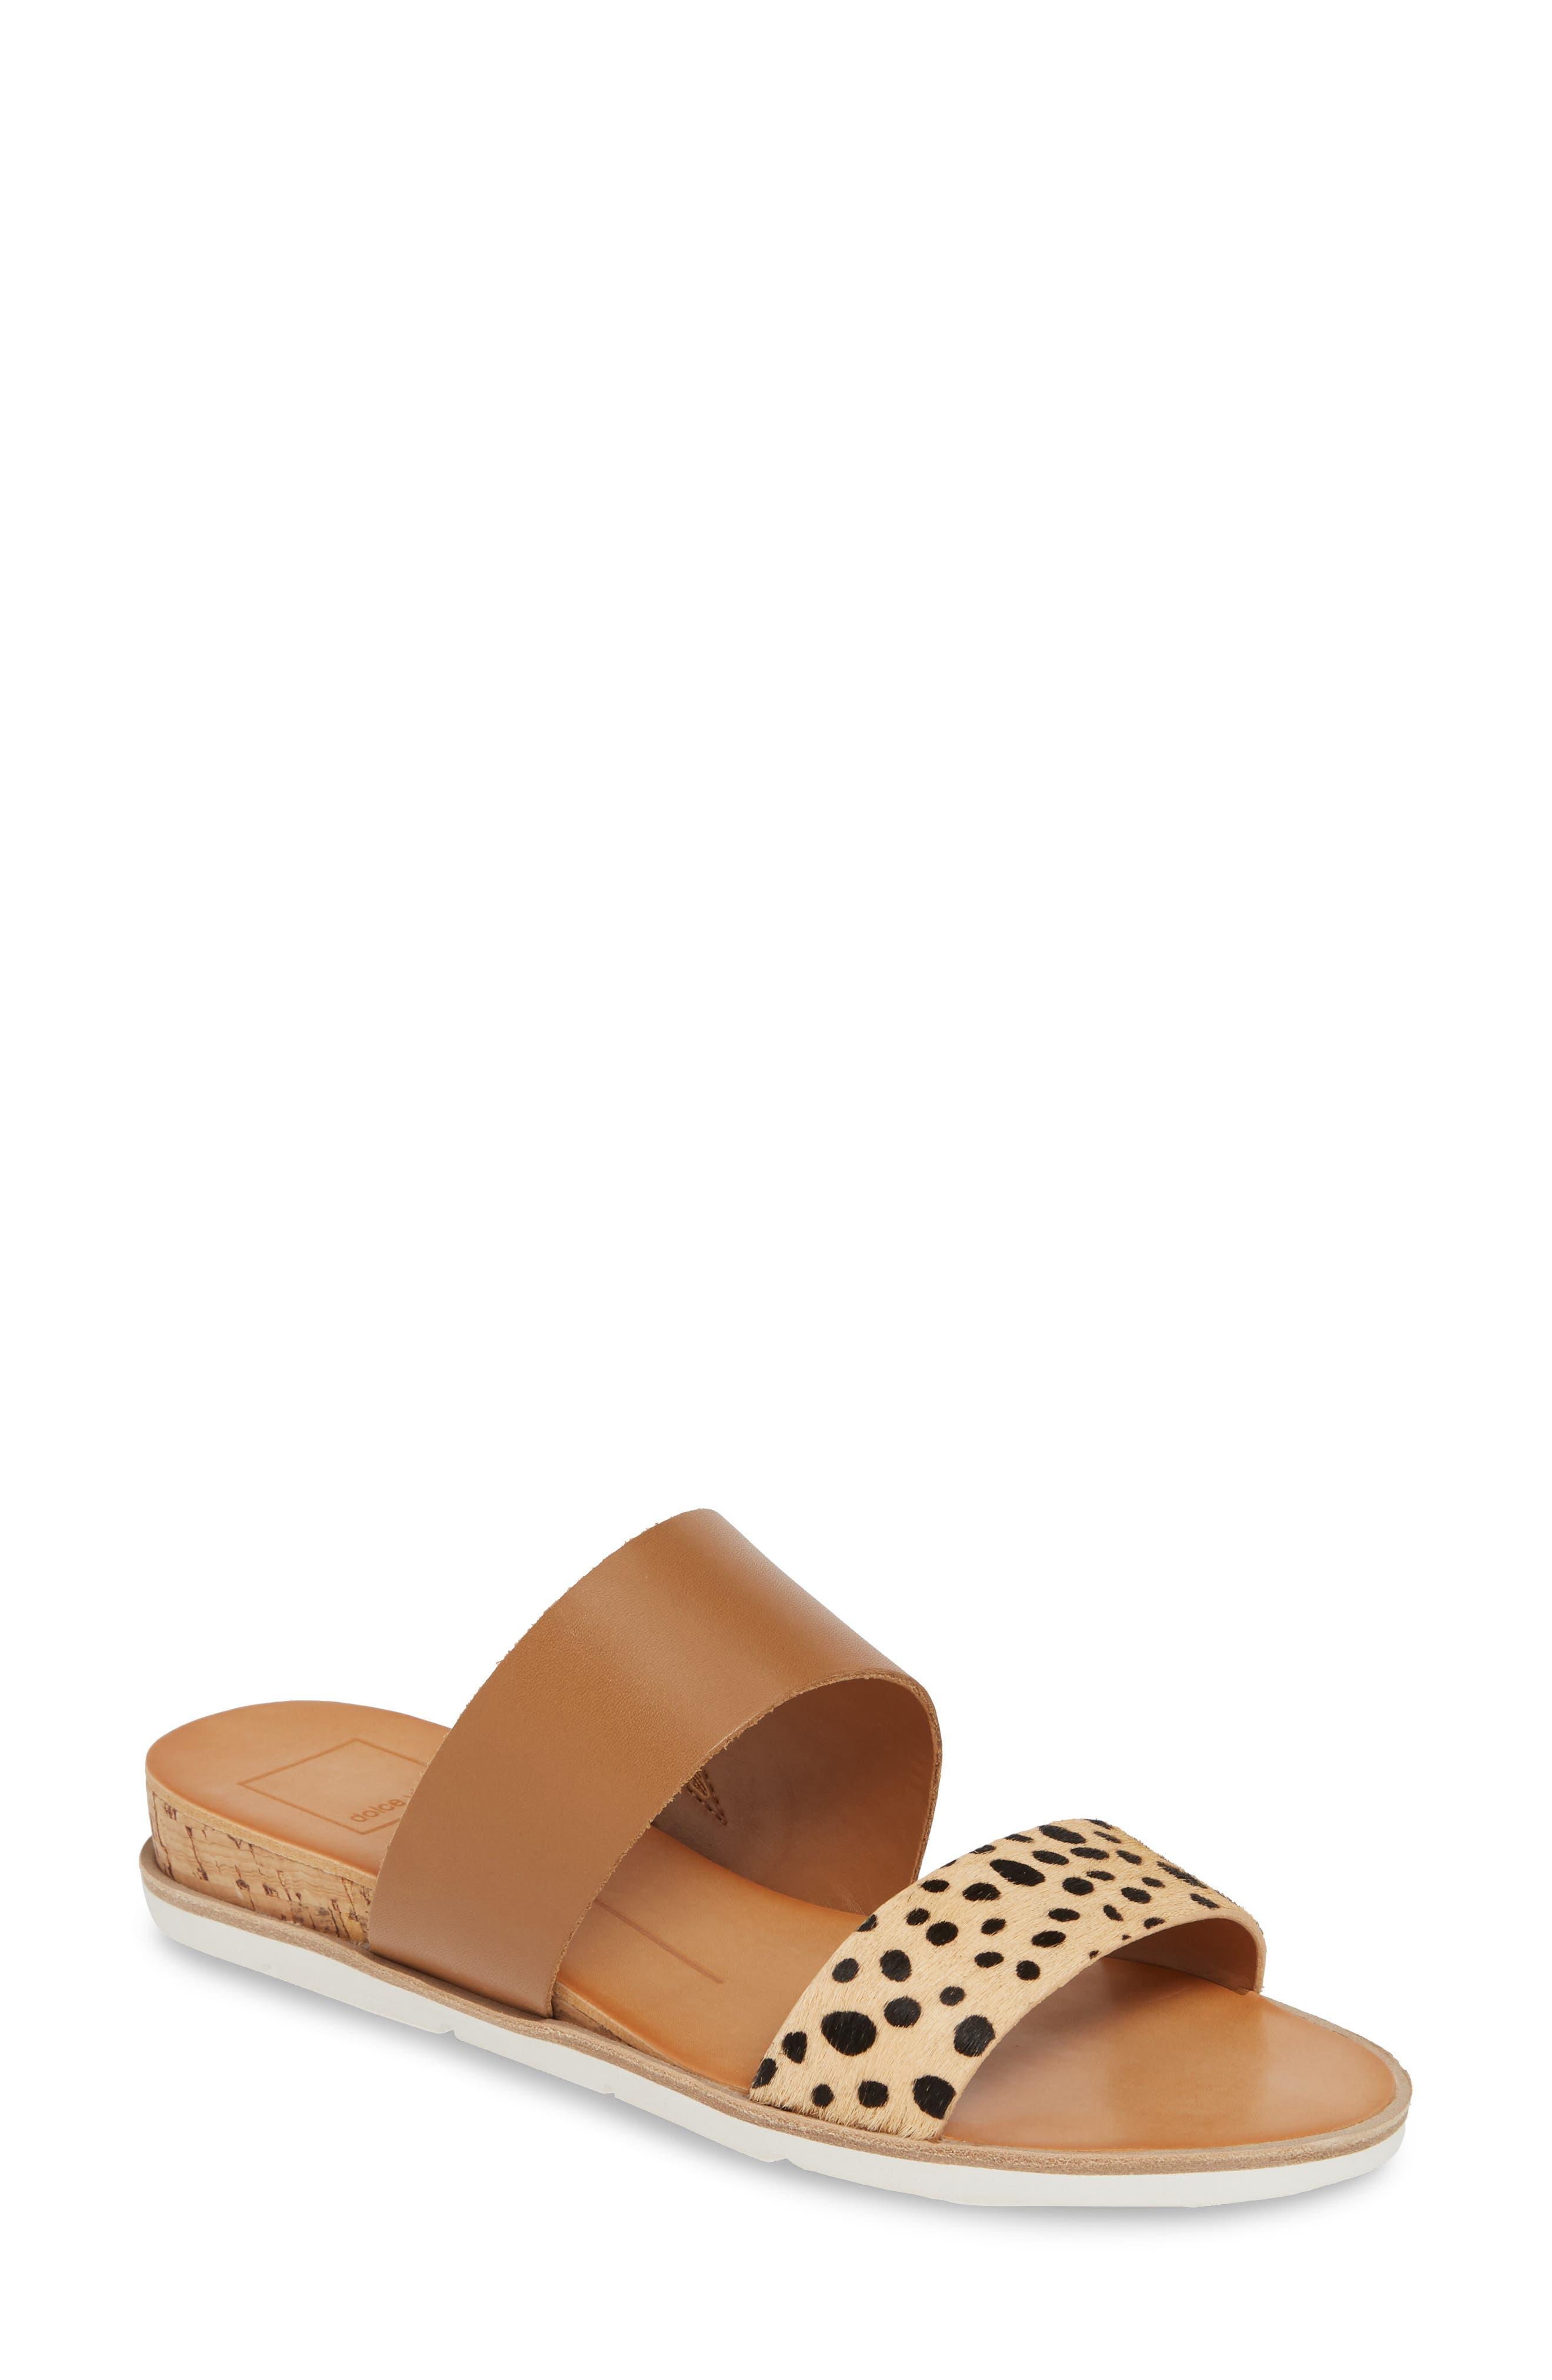 DOLCE VITA Vala Wedge Slide Sandal, Main, color, LEOPARD CALF HAIR